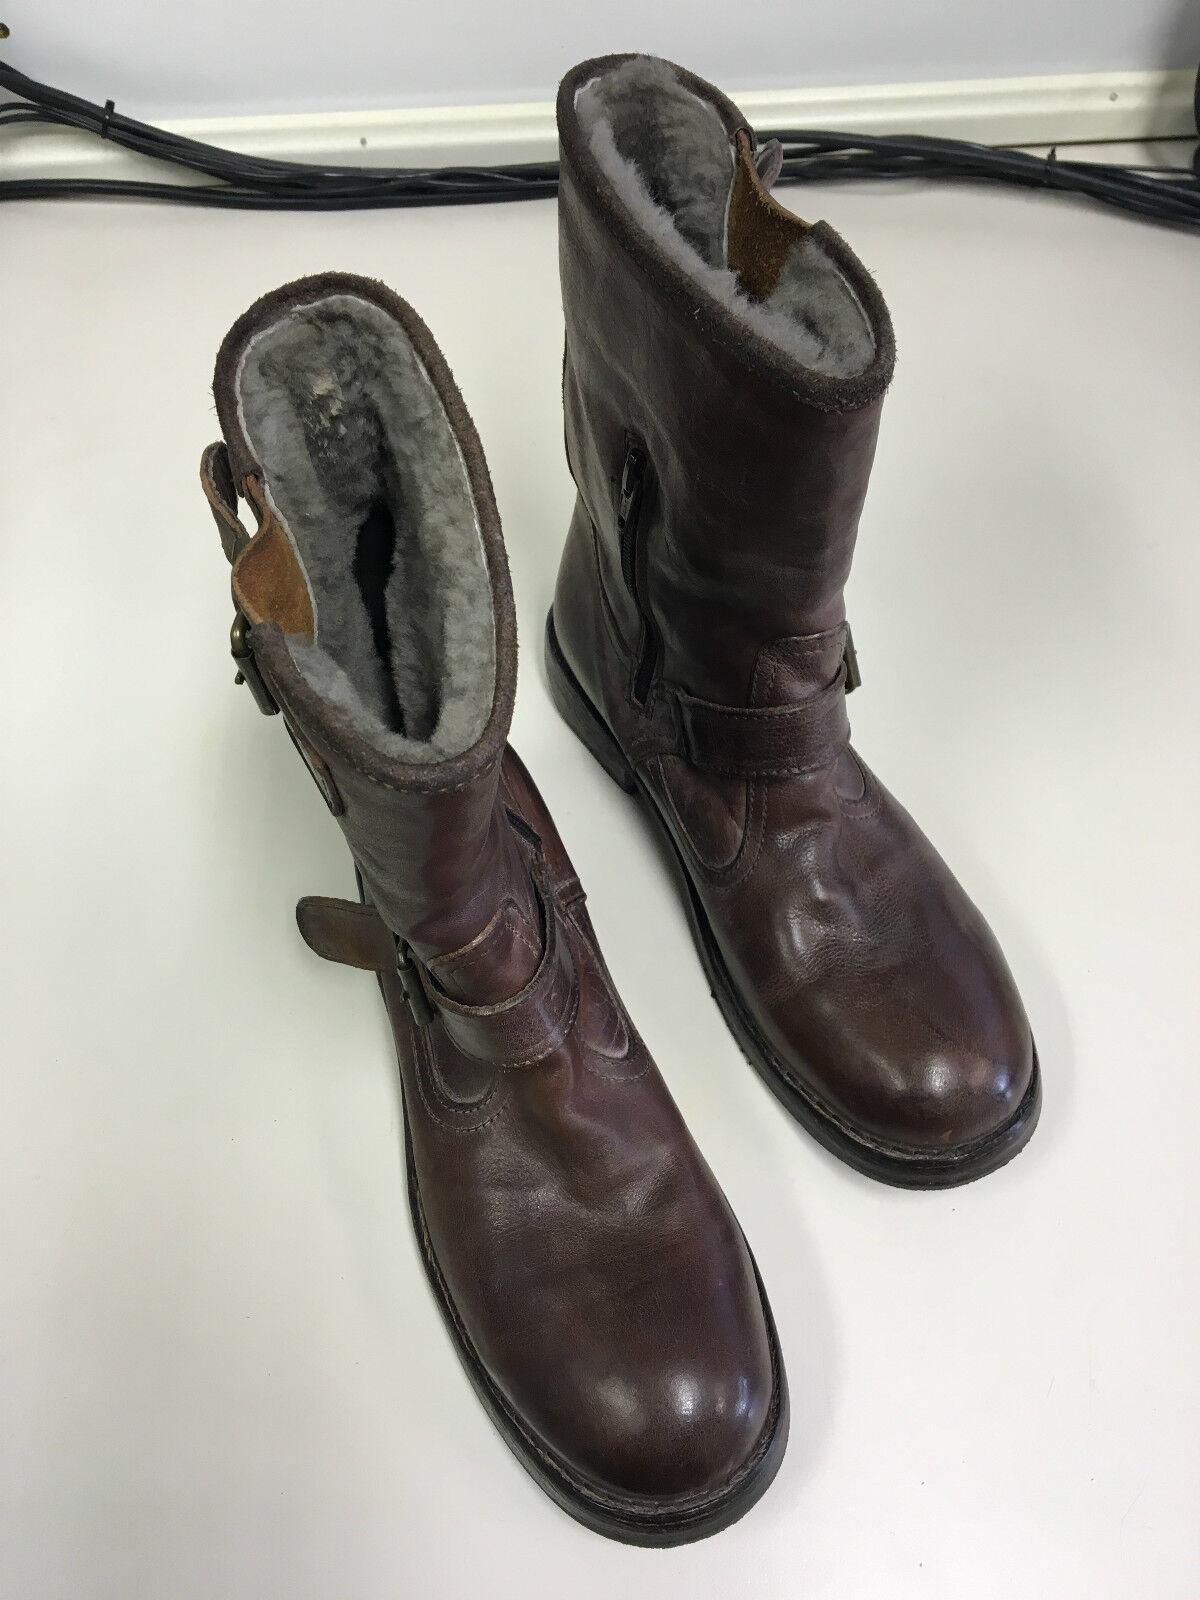 MOMA Stiefel Halbstiefel Half Boot Gr. Stiefel Damen Damen Stiefel Woman braun Gr 4304a8